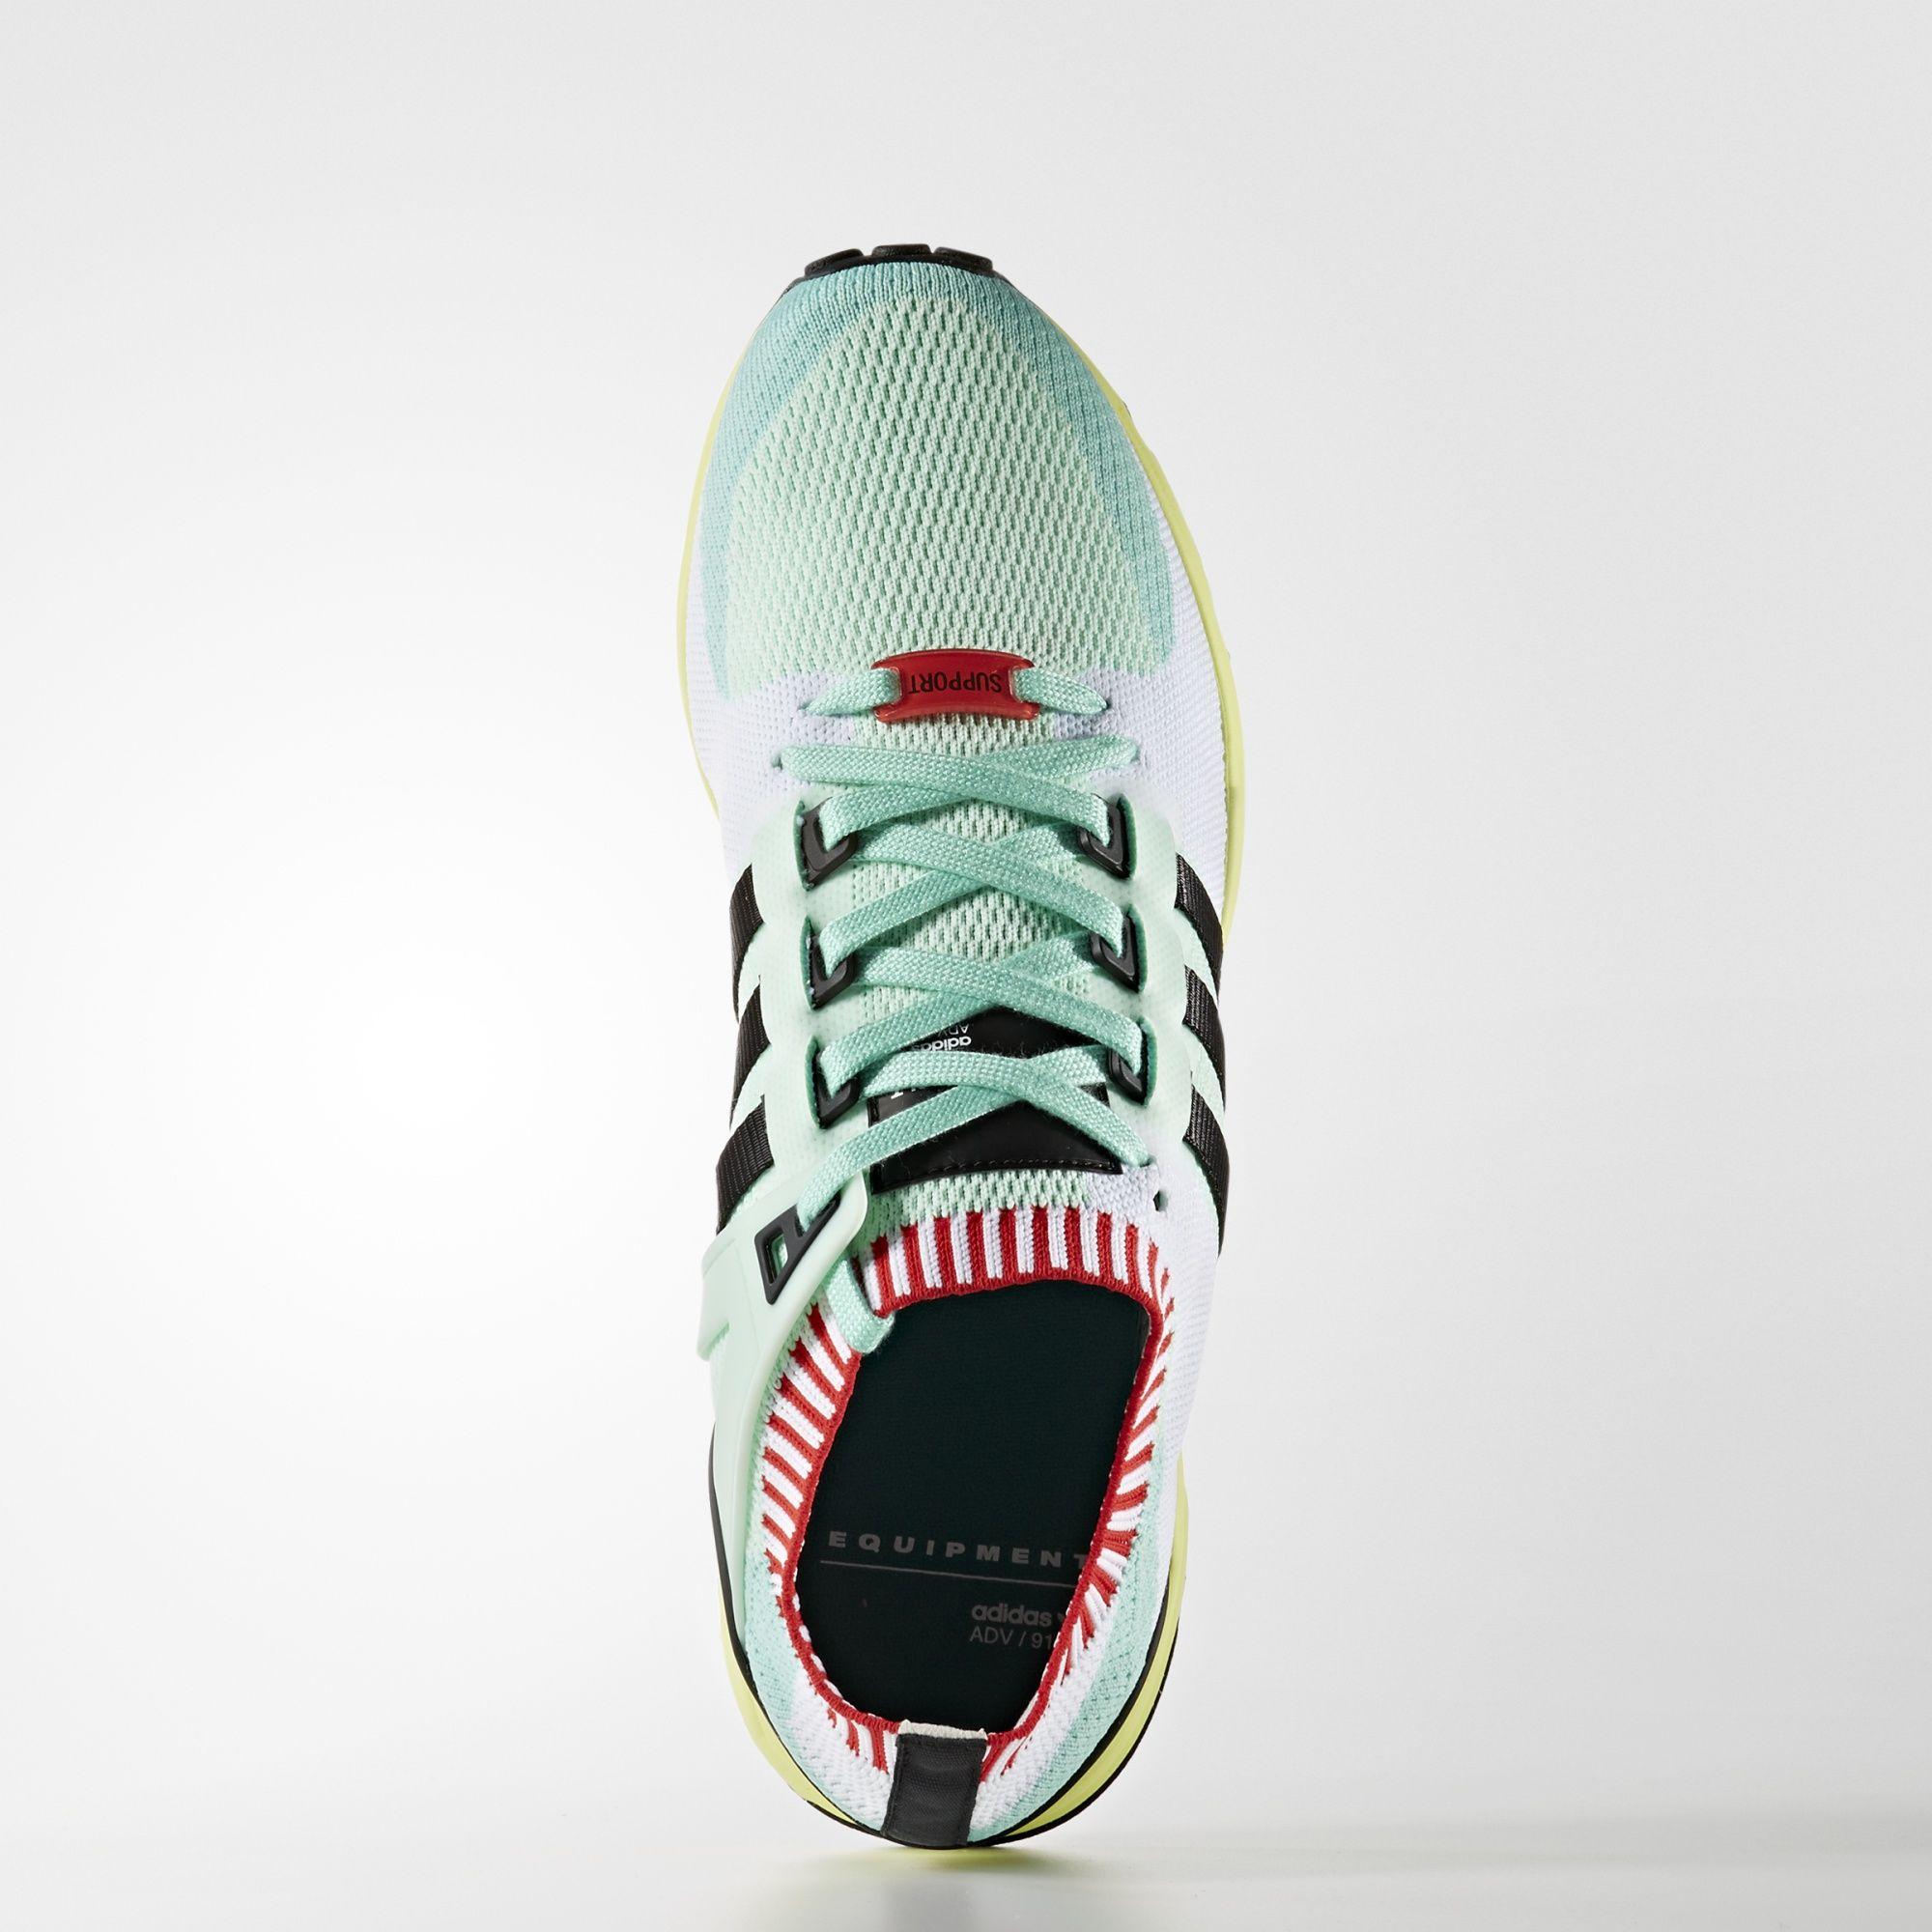 adidas EQT Support RF Primeknit Frozen Green BA7506 1